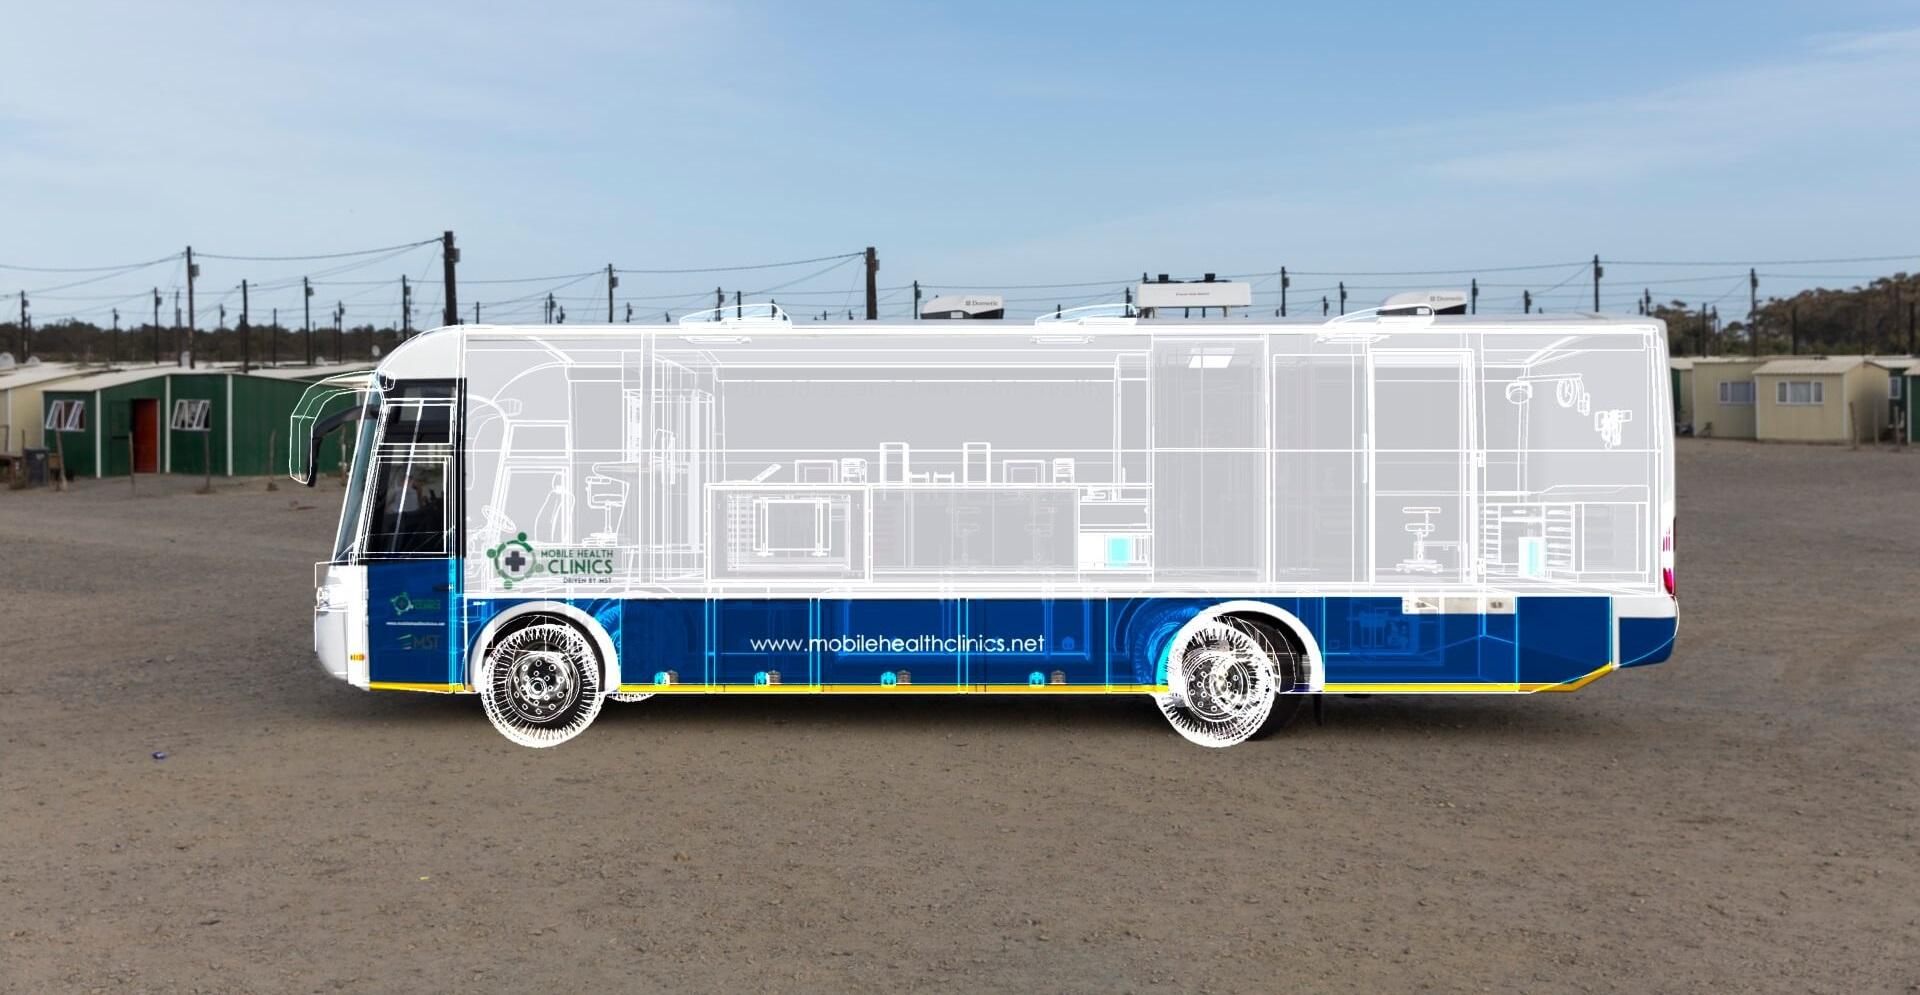 Mobile Health Clinics bus